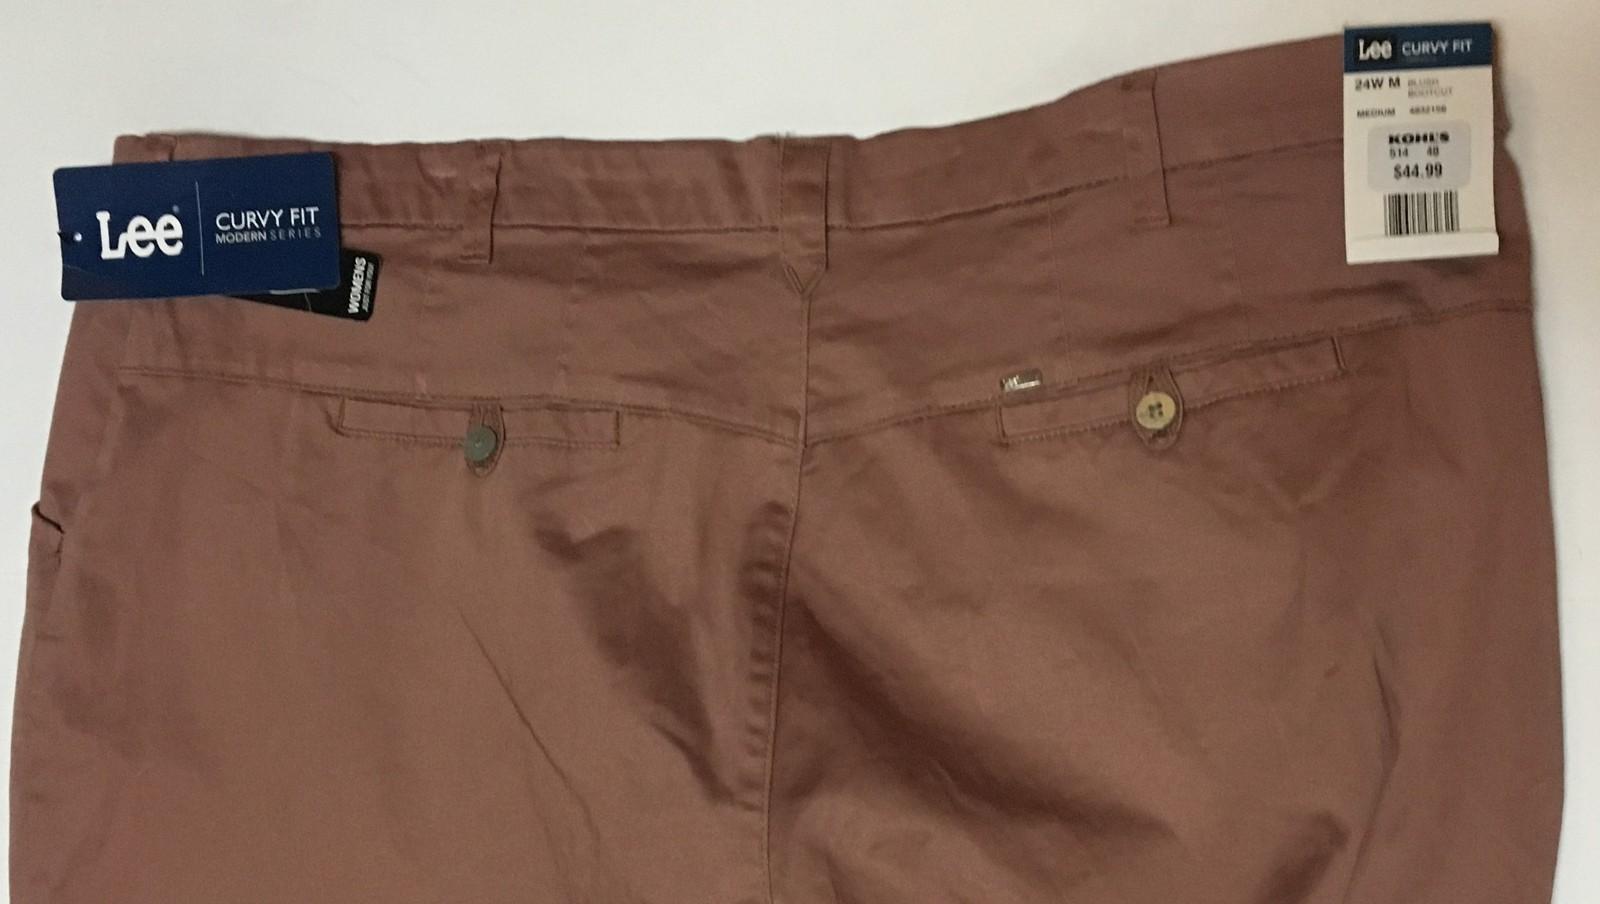 Lee Modern Series Curvy Fit Bootcut Pants 24 W Medium Fuchsia